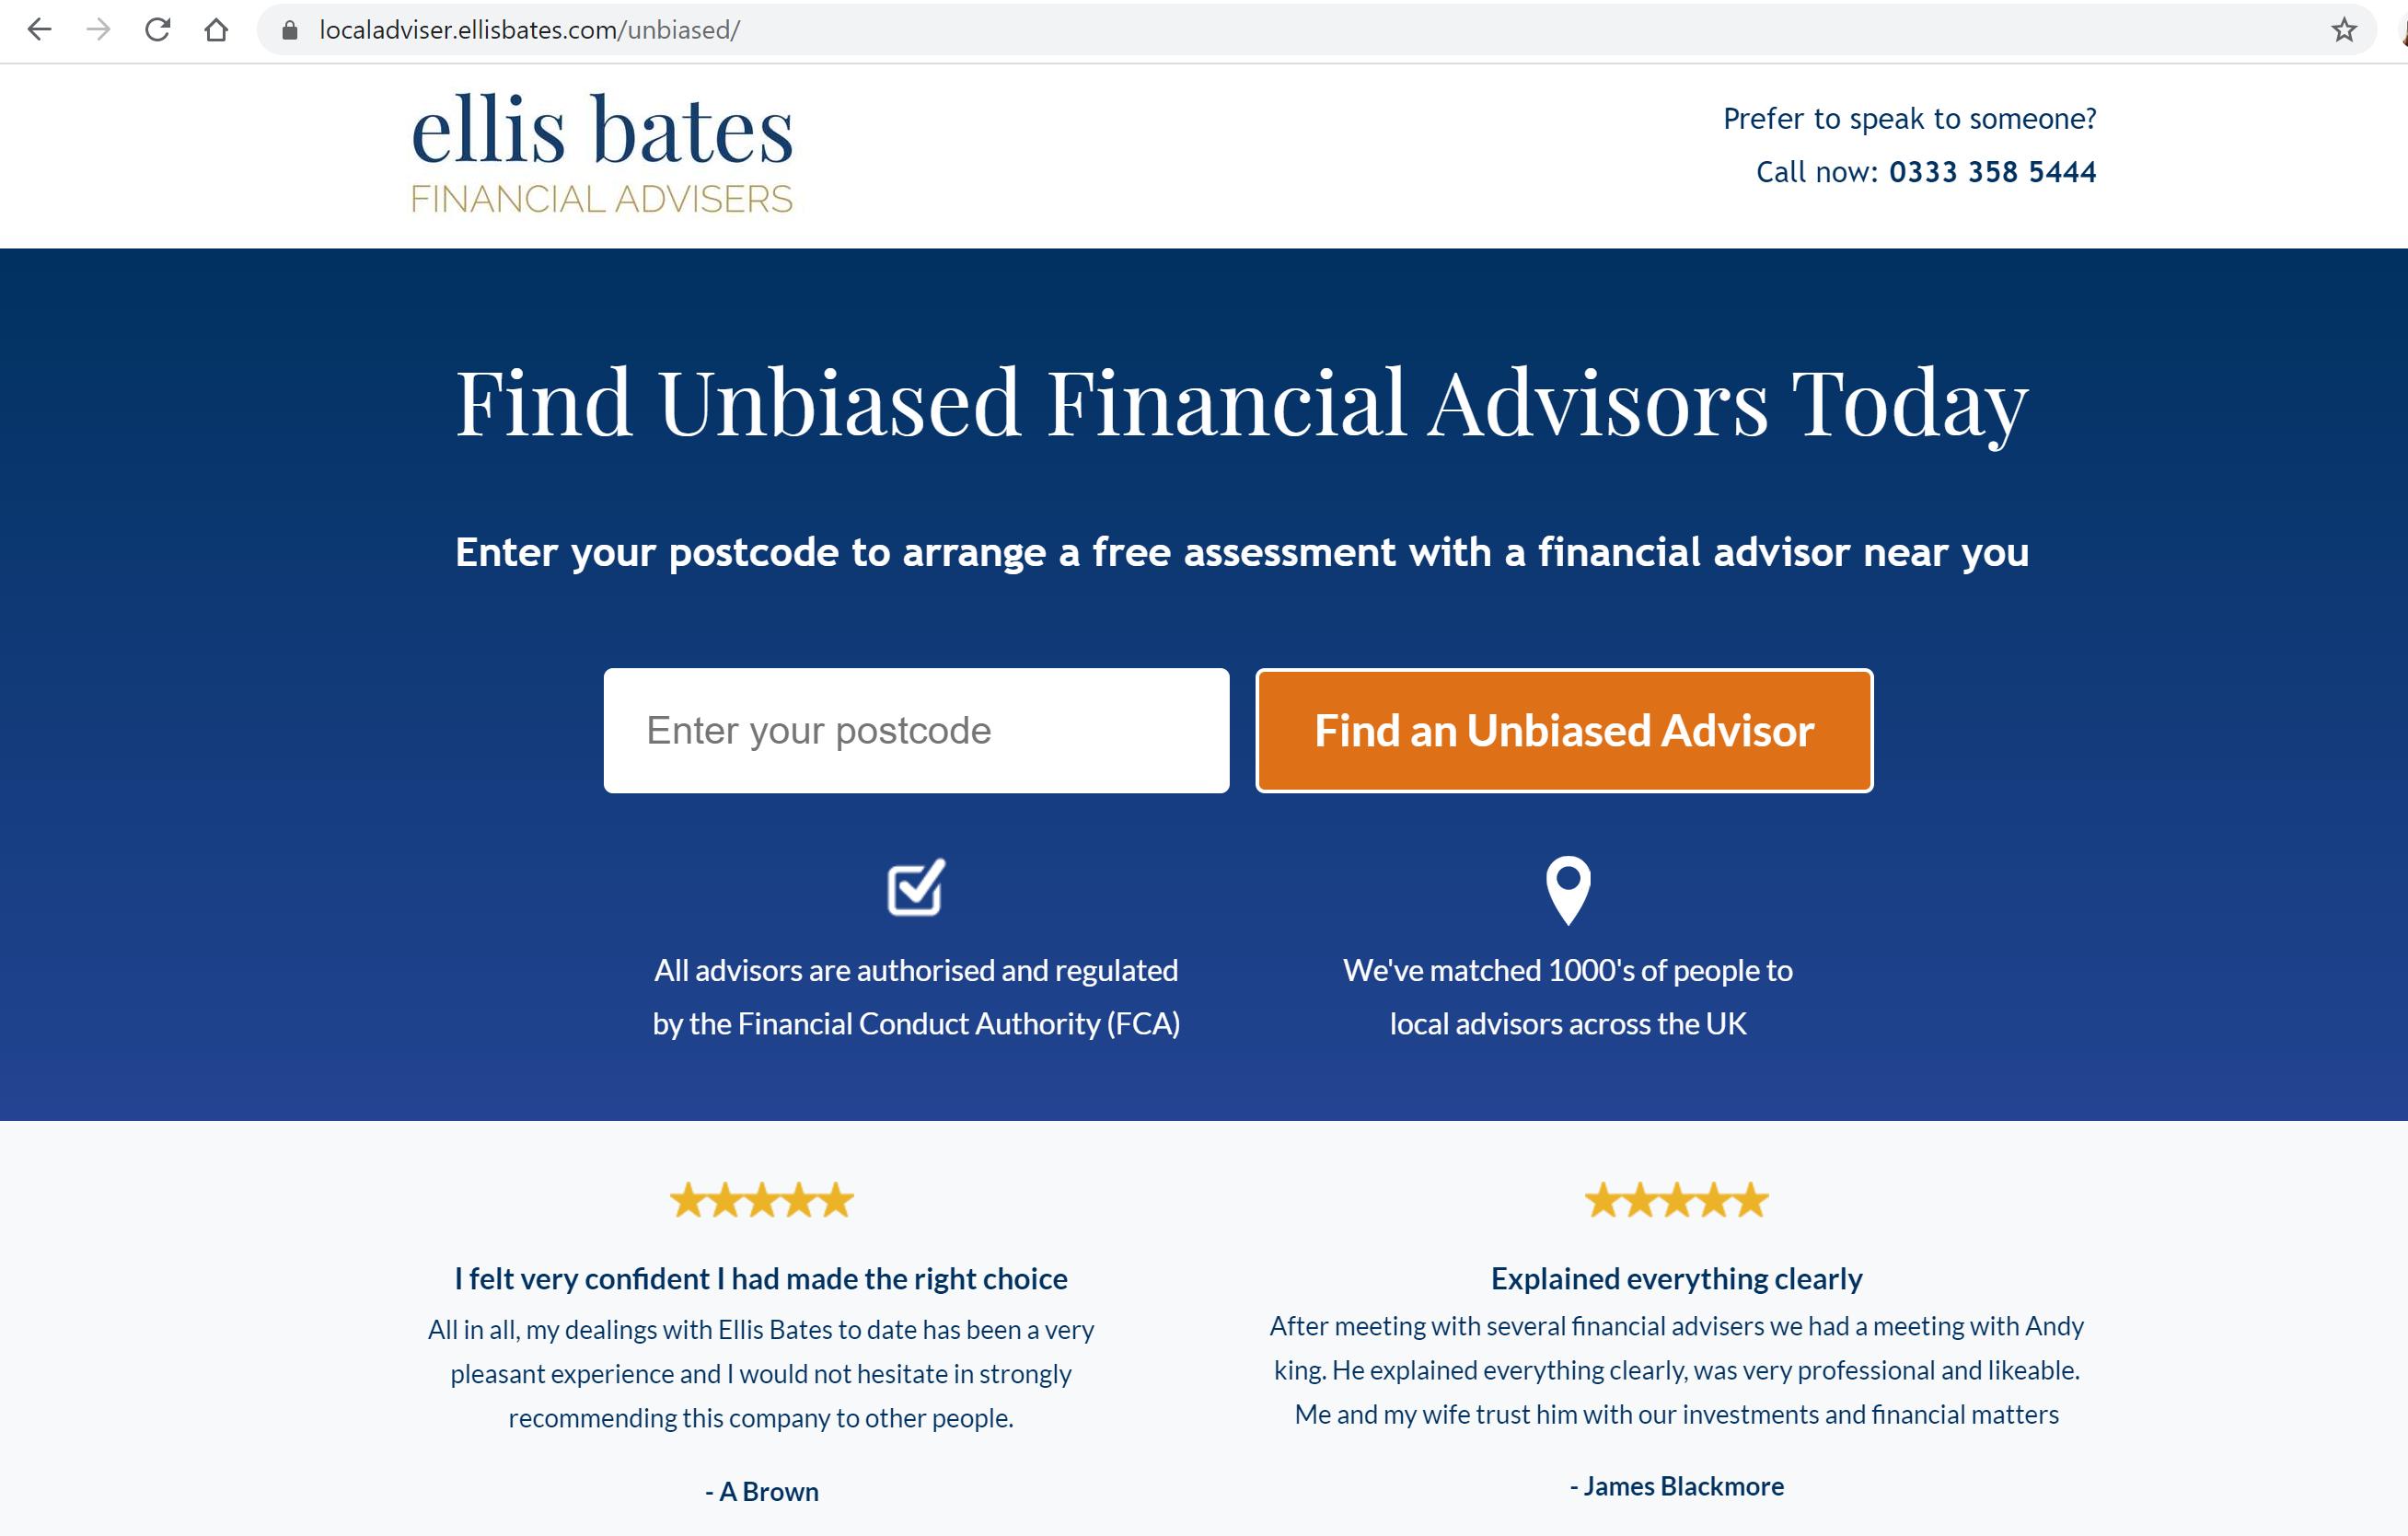 The Ellis Bates website before it was updated